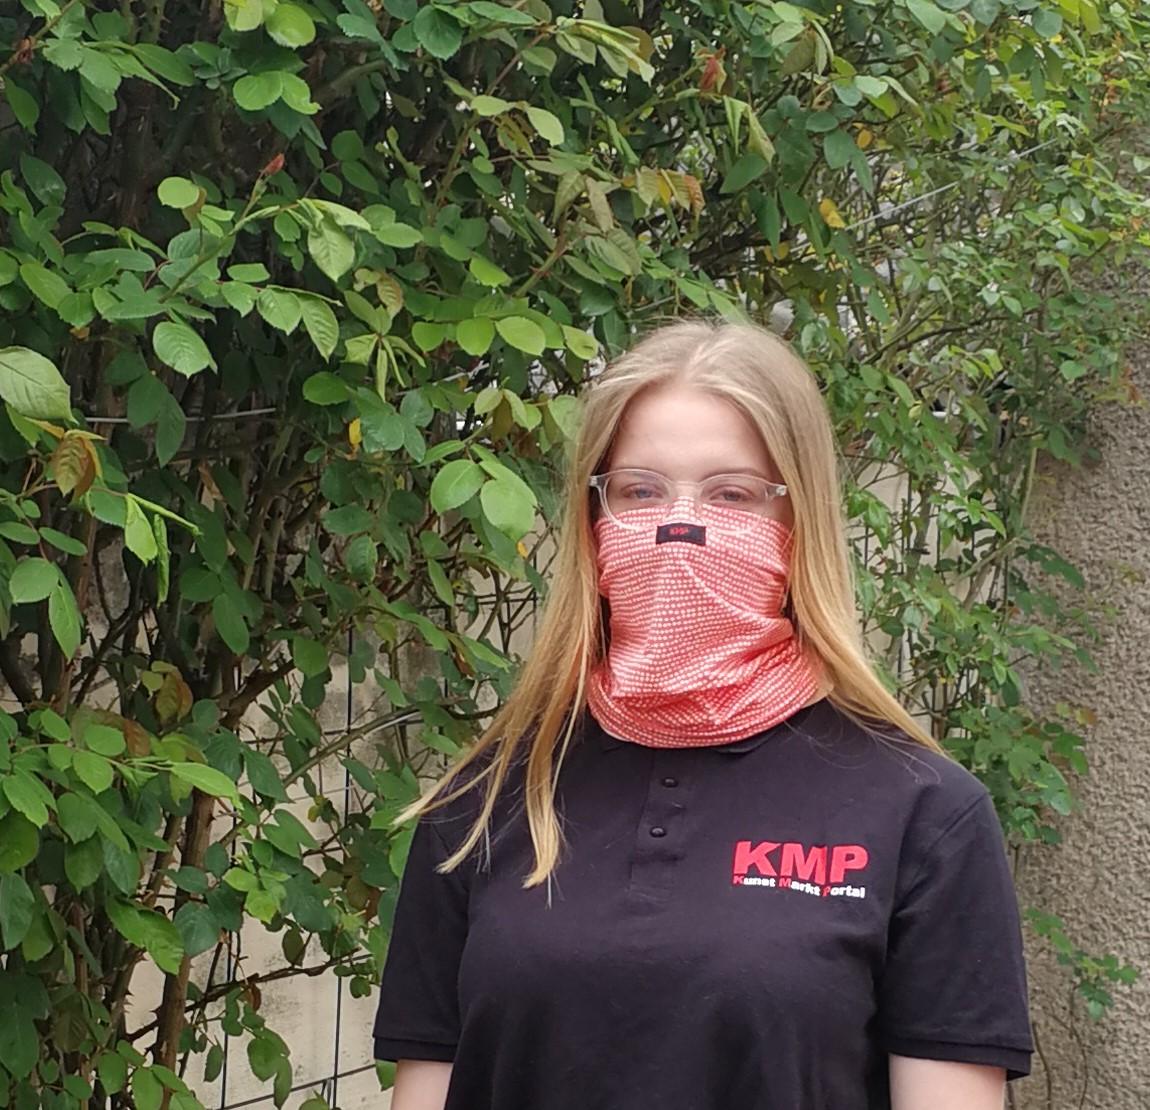 Sabrina mit KMP-Multifunktionstuch in Farbe Lachs